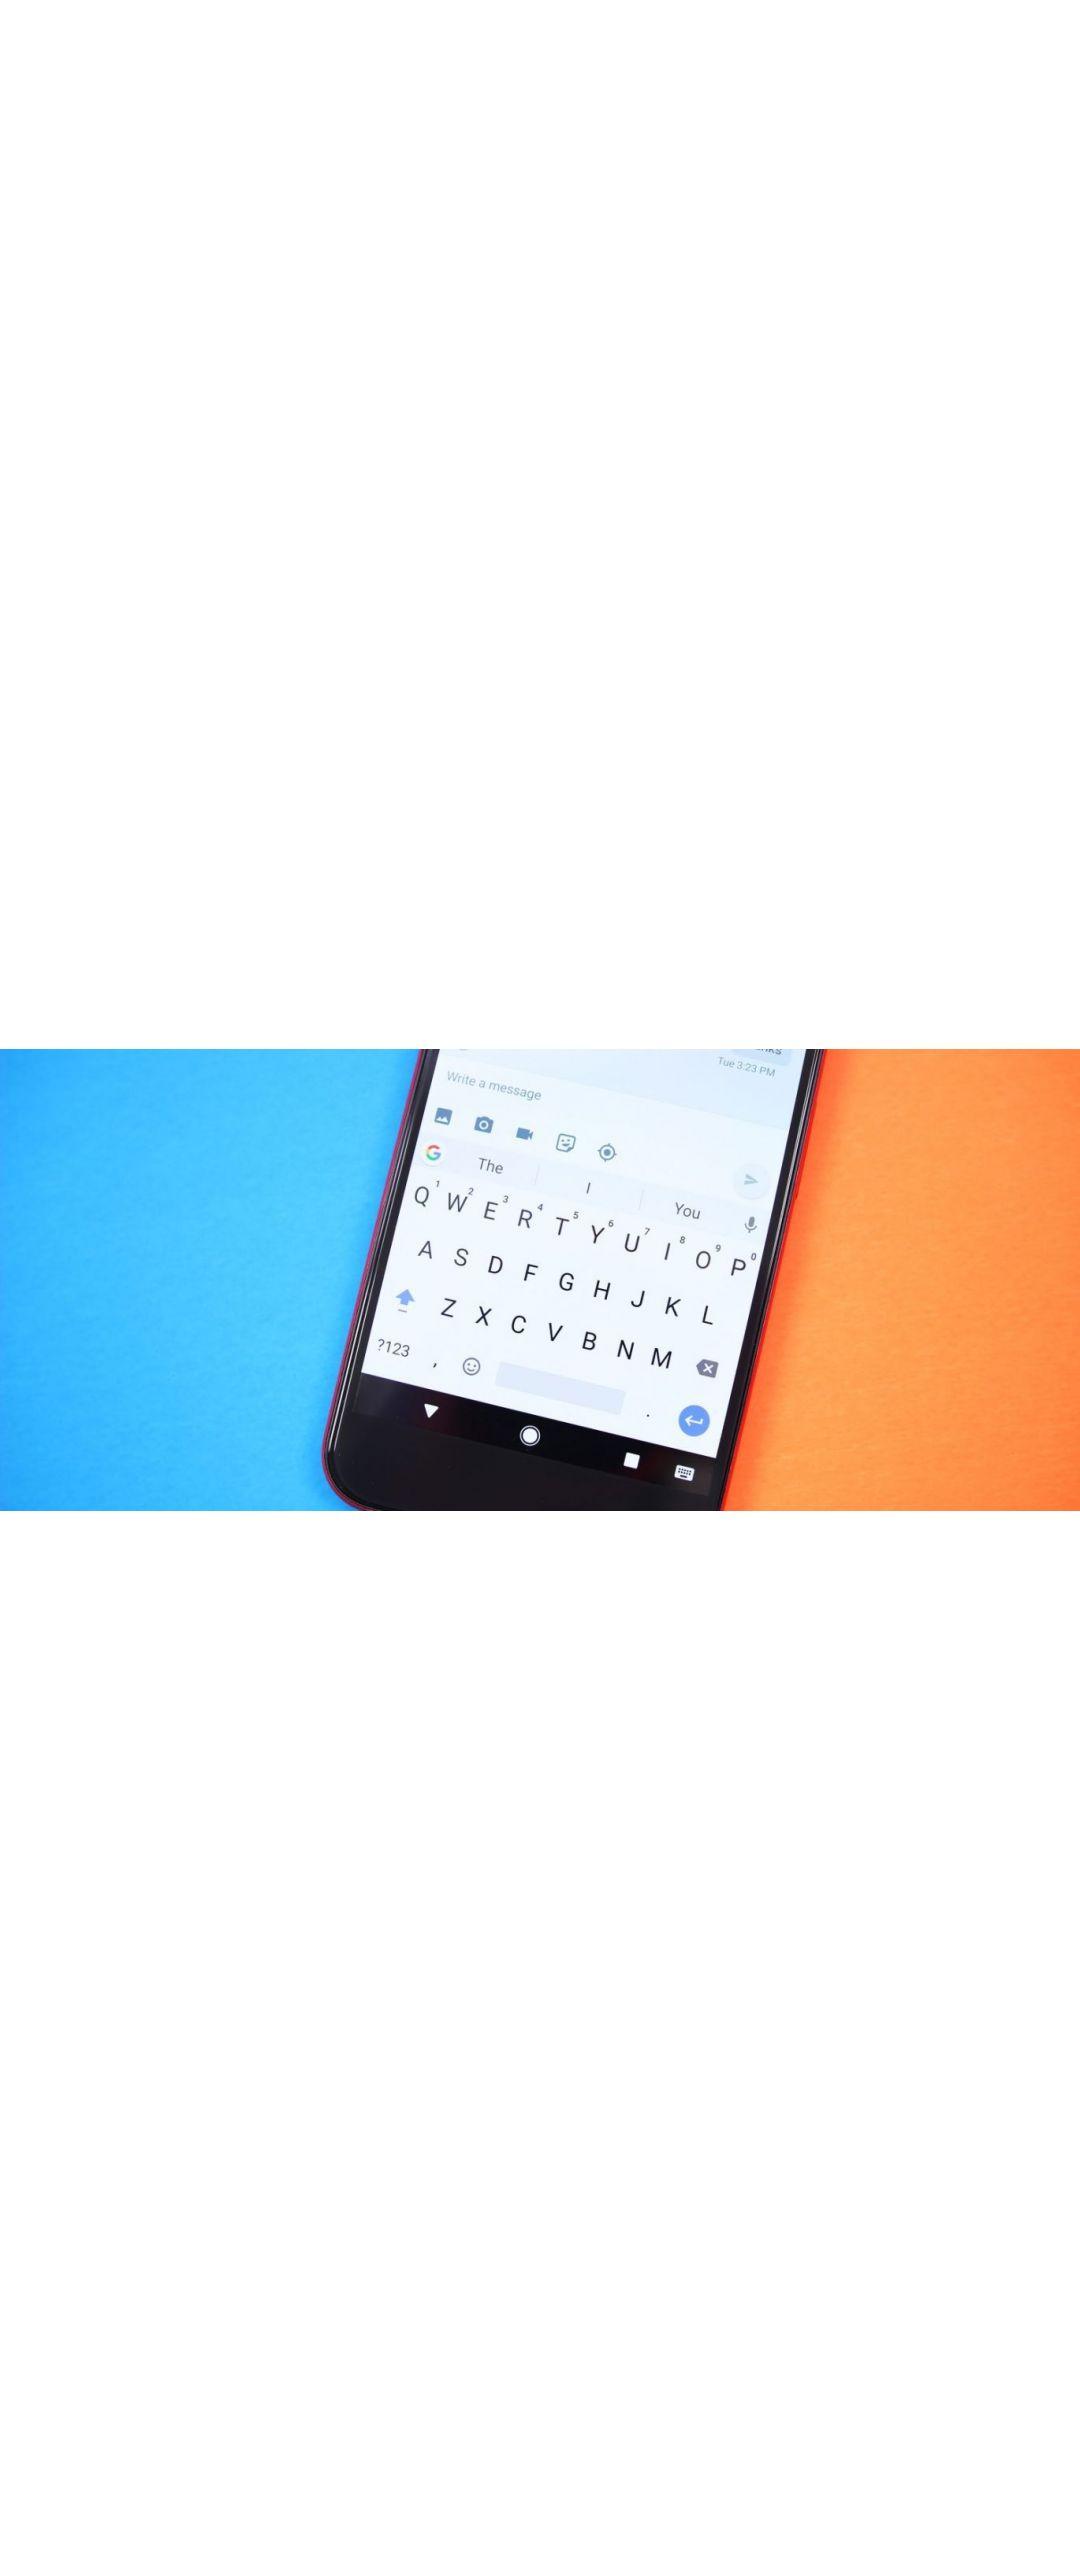 Gboard para Android se actualiza para traducir texto mientras escribes